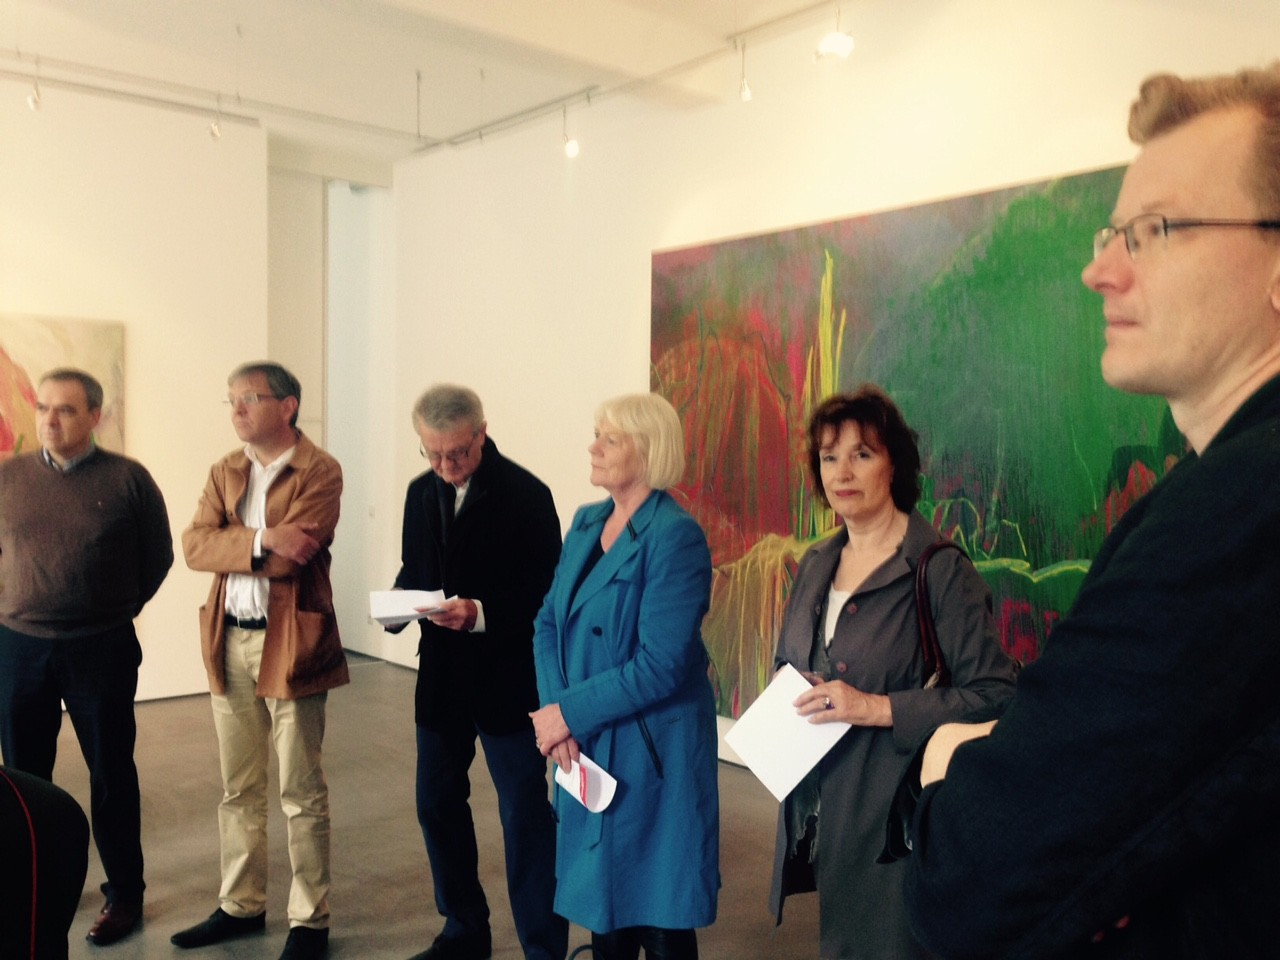 Galerienrundgang, 21.6.2015; Galerie Judith Andreae